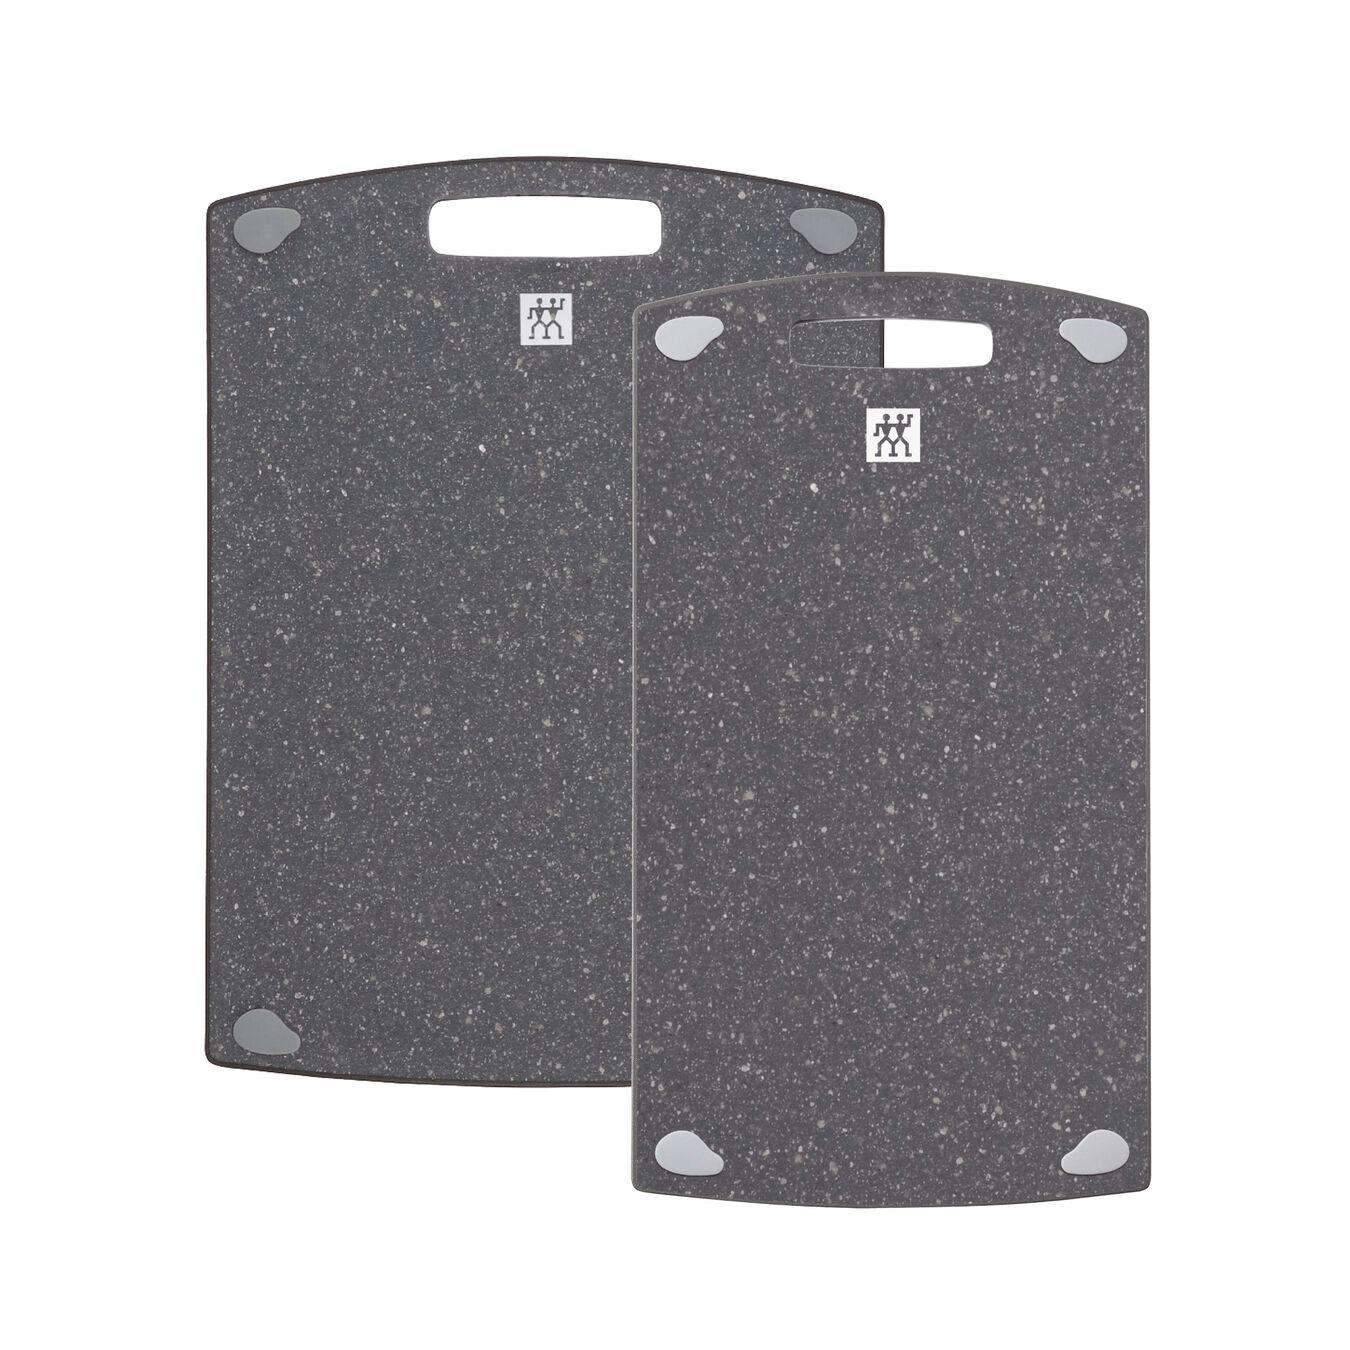 2 pc. Cutting board set, Plastic   36 cm x 20 cm & 37 cm x 27 cm 36 cm x 20 cm,,large 2